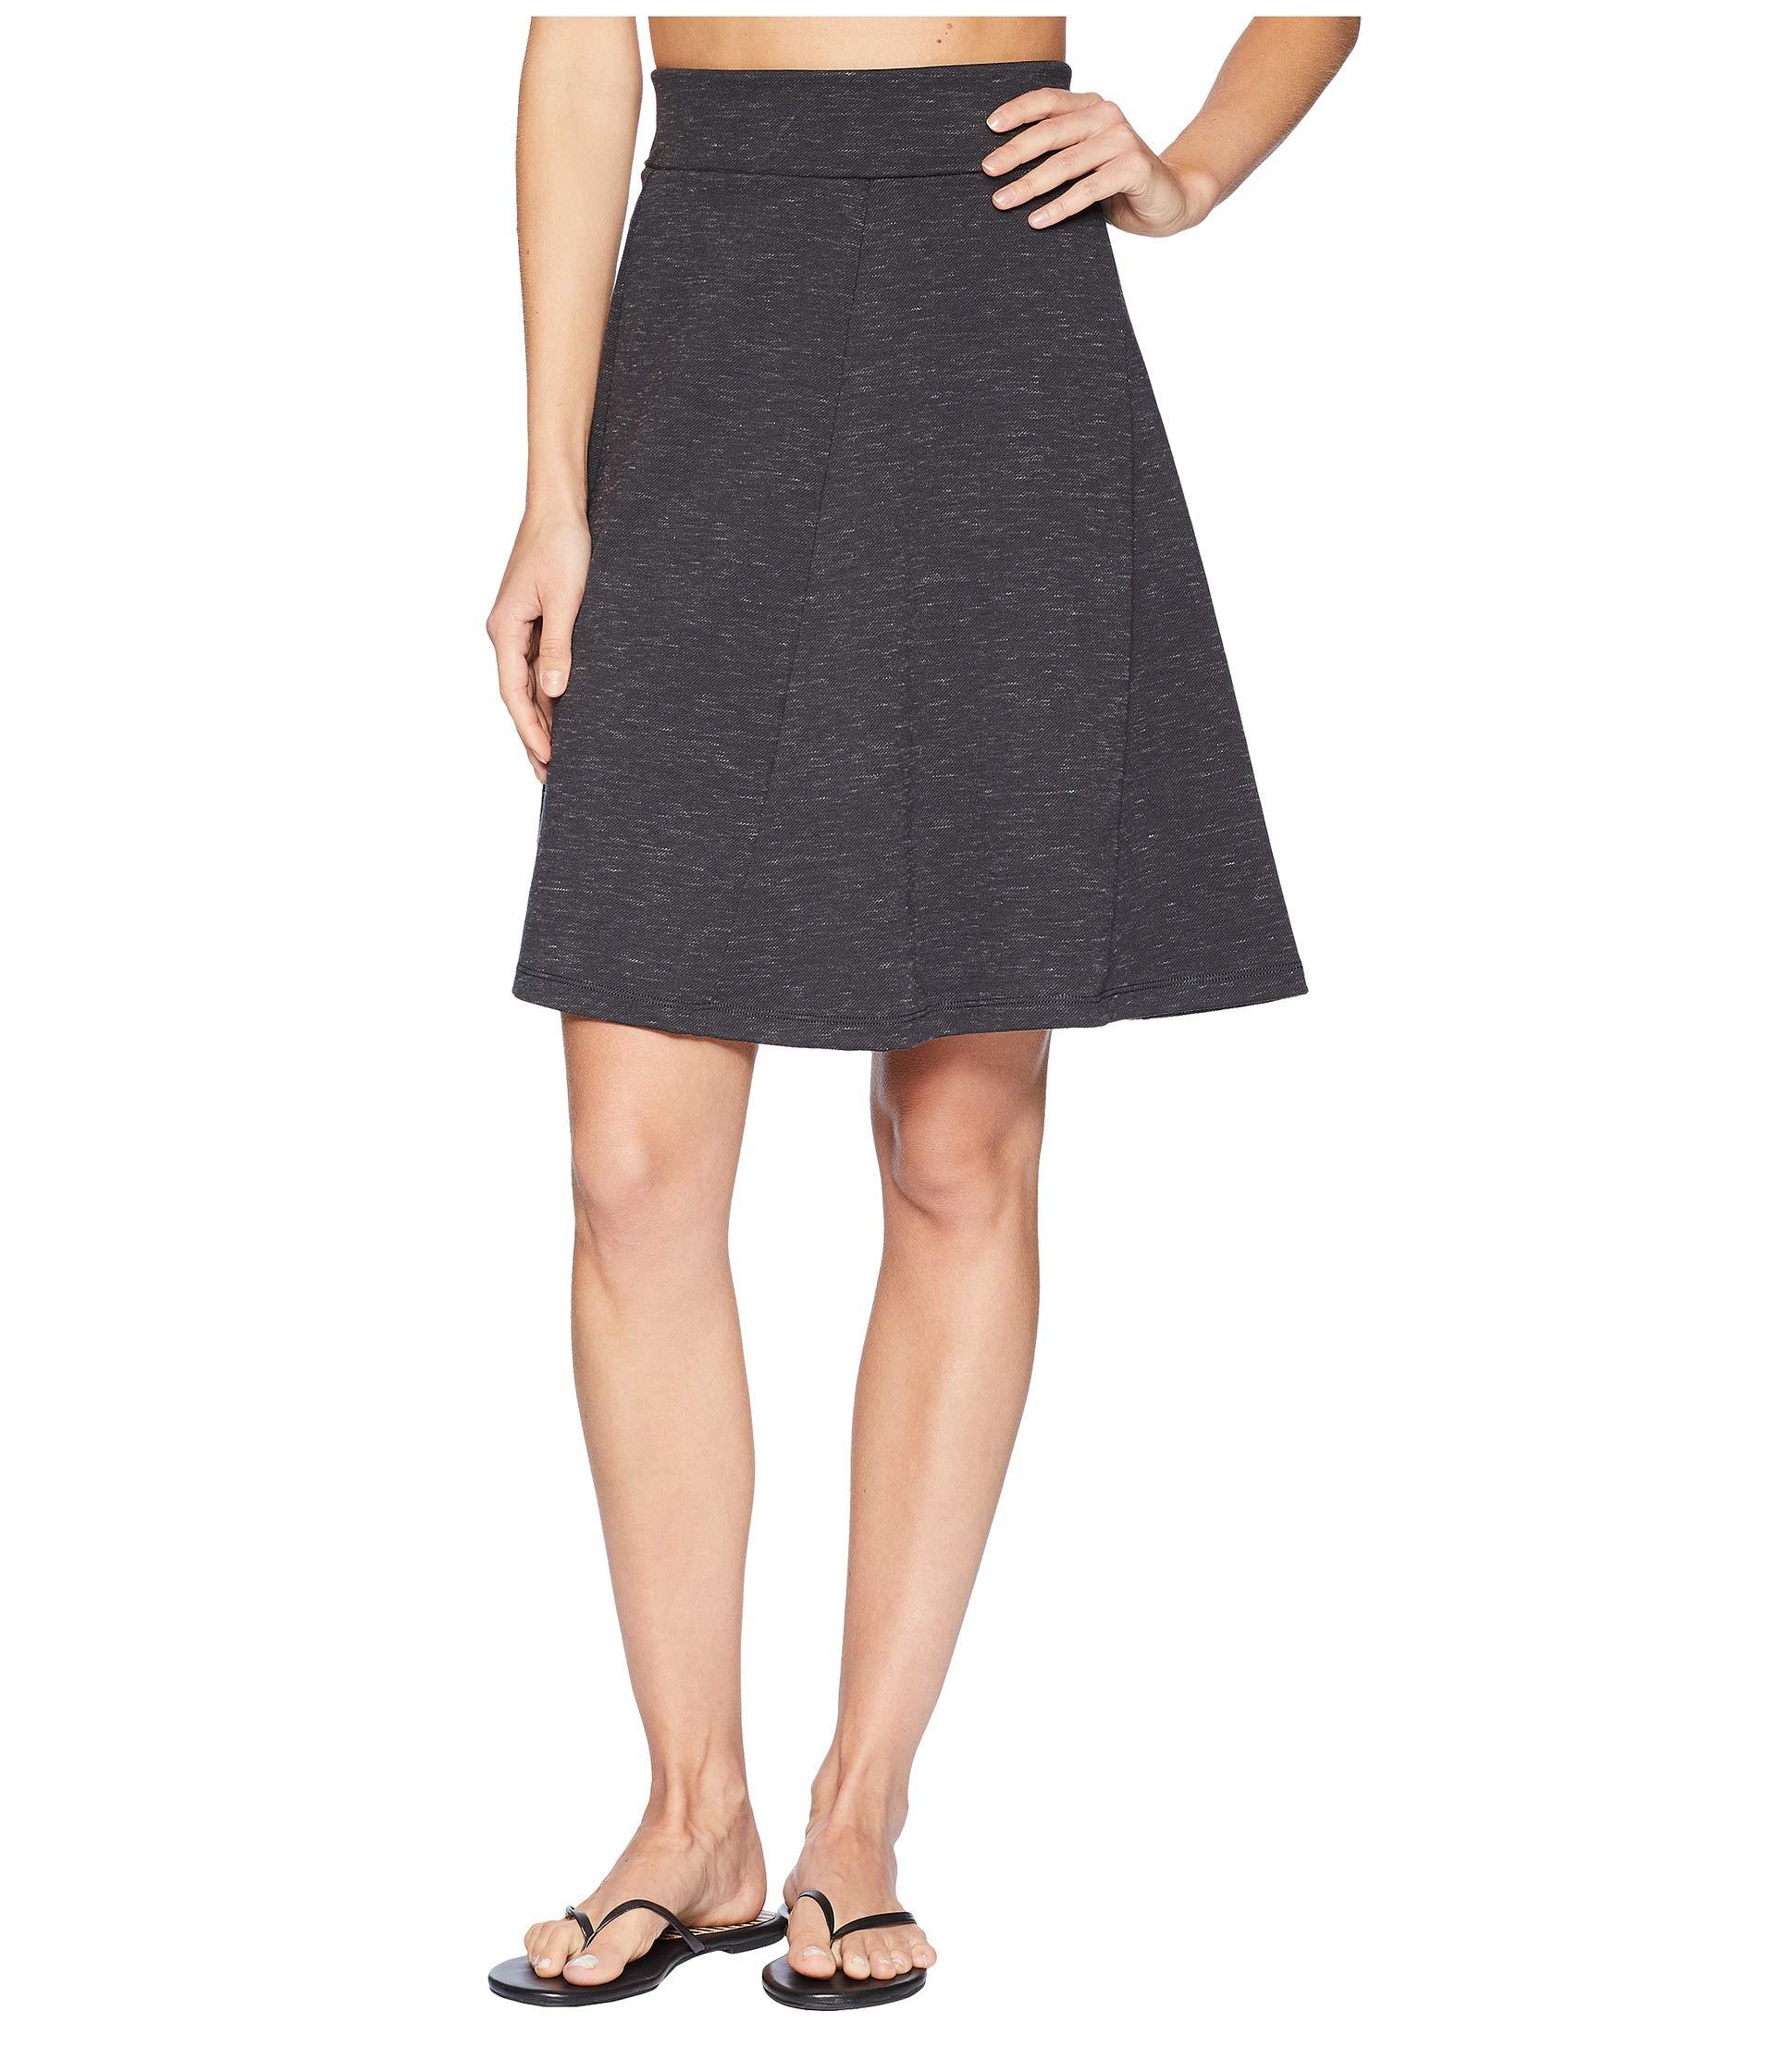 Royal Robbins Women's Geneva Ponte Skirt, Medium, Charcoal Heather by Royal Robbins